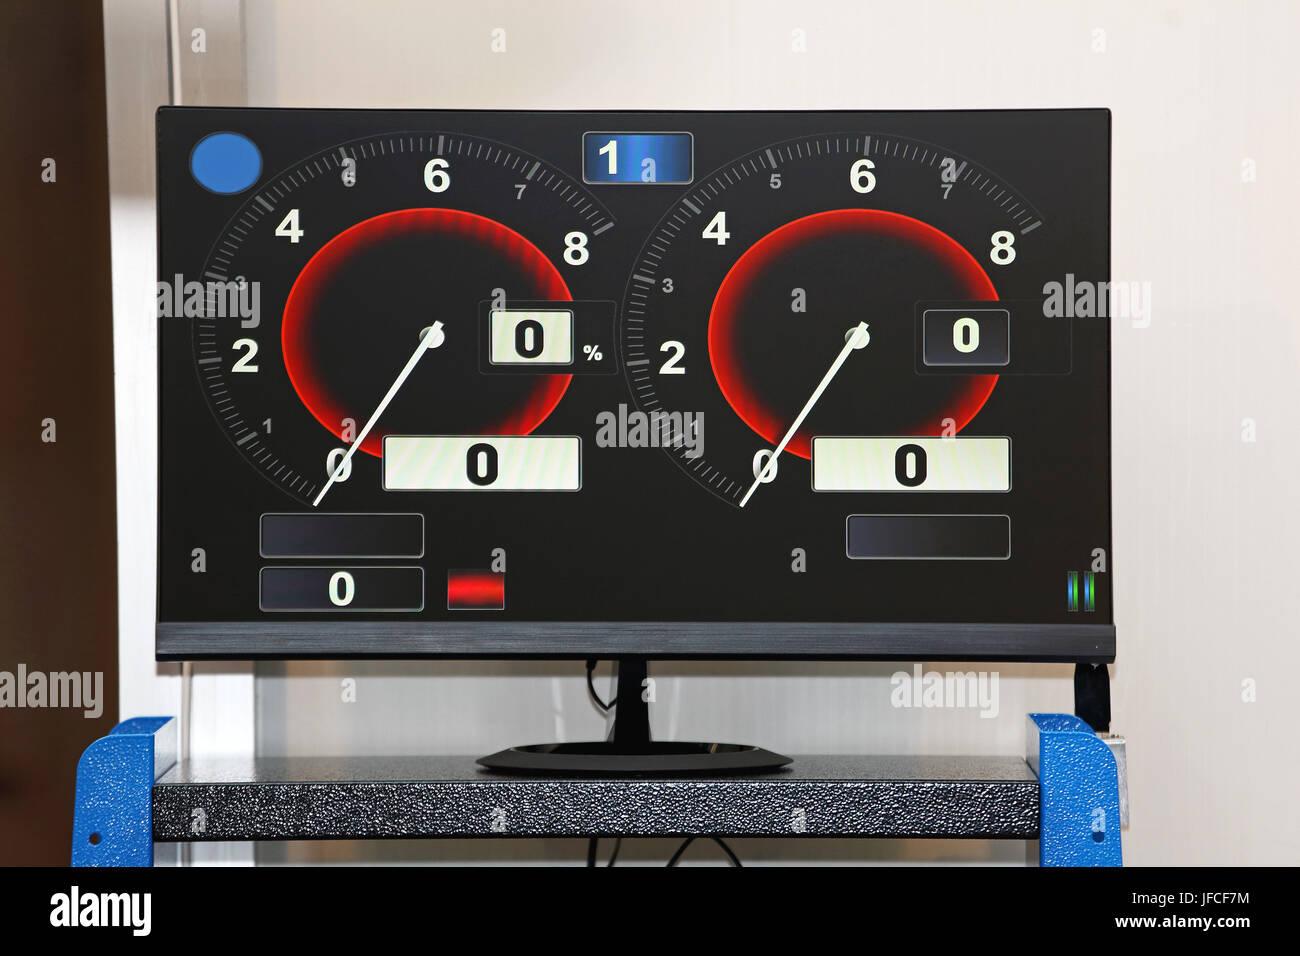 Wheels Alignment Display - Stock Image